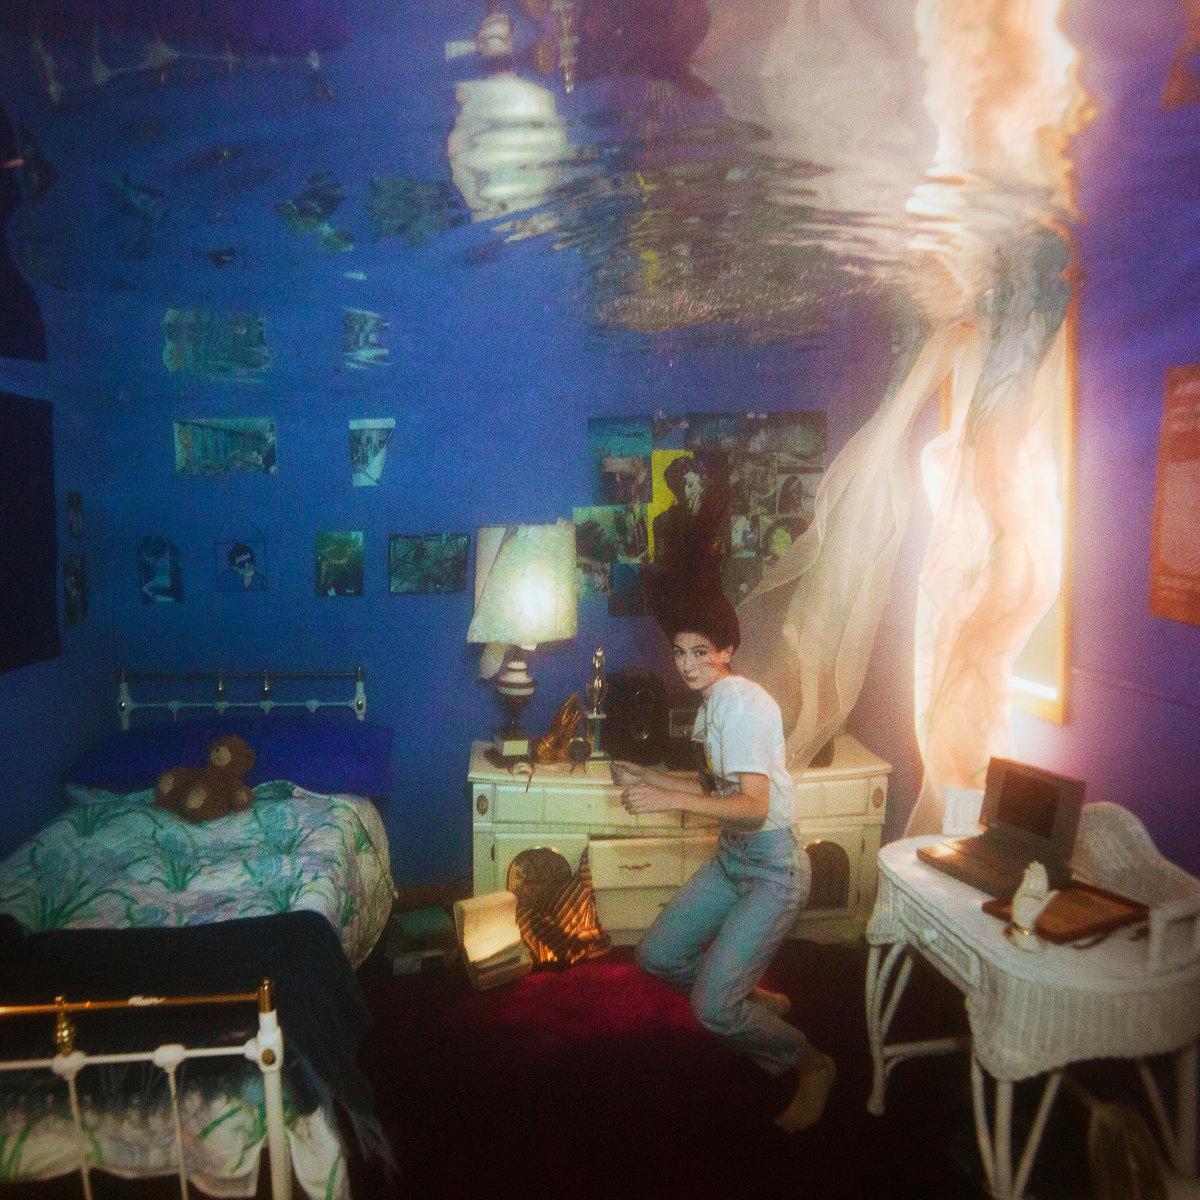 Weyes Blood - Titanic Rising - Les Oreilles Curieuses